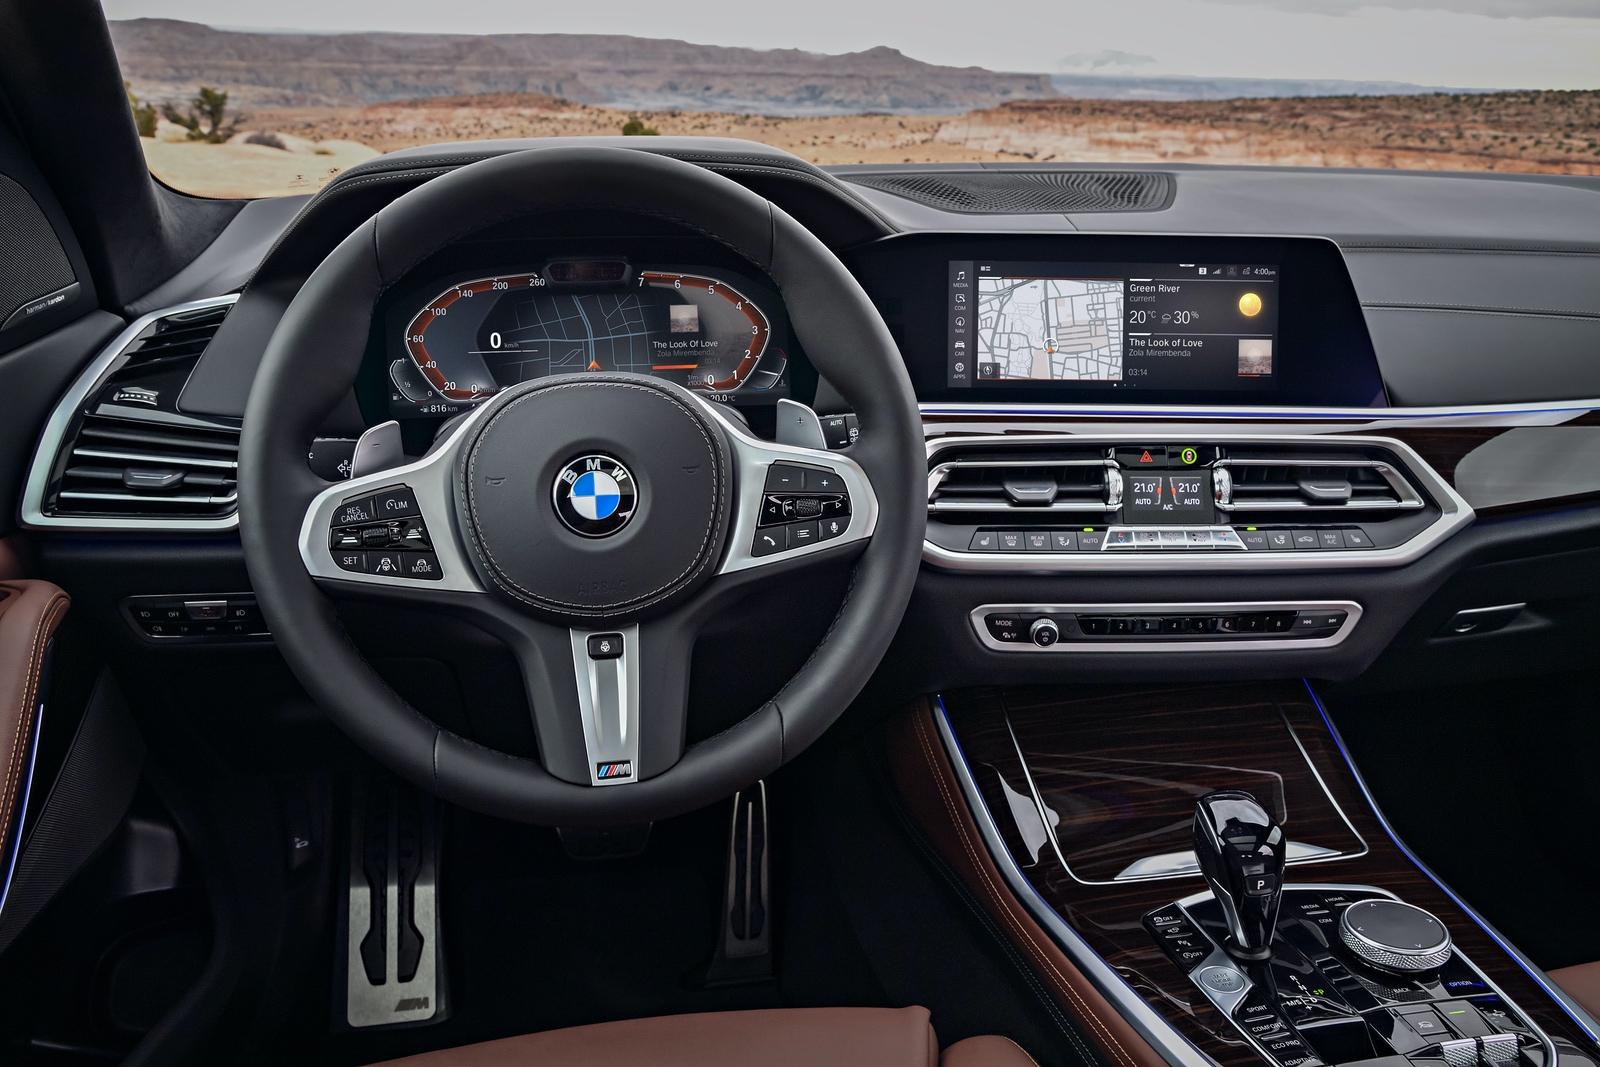 BMW X5 pricing